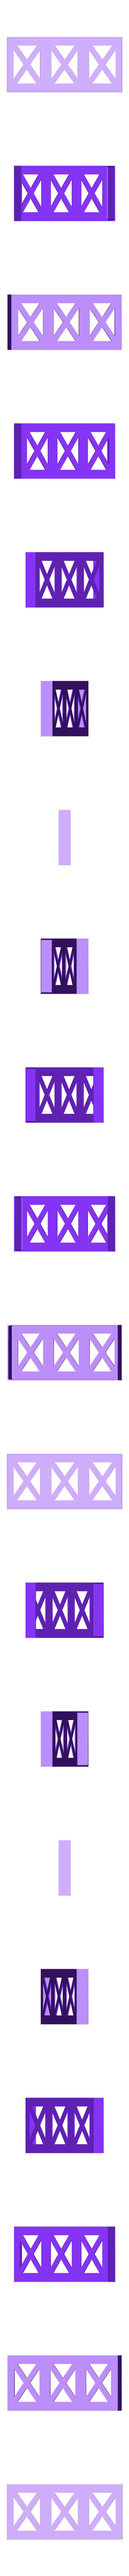 SoB_3_deck_holder_Lid.stl Download free STL file Shadows of brimstone box organizer • 3D print object, gthanatos